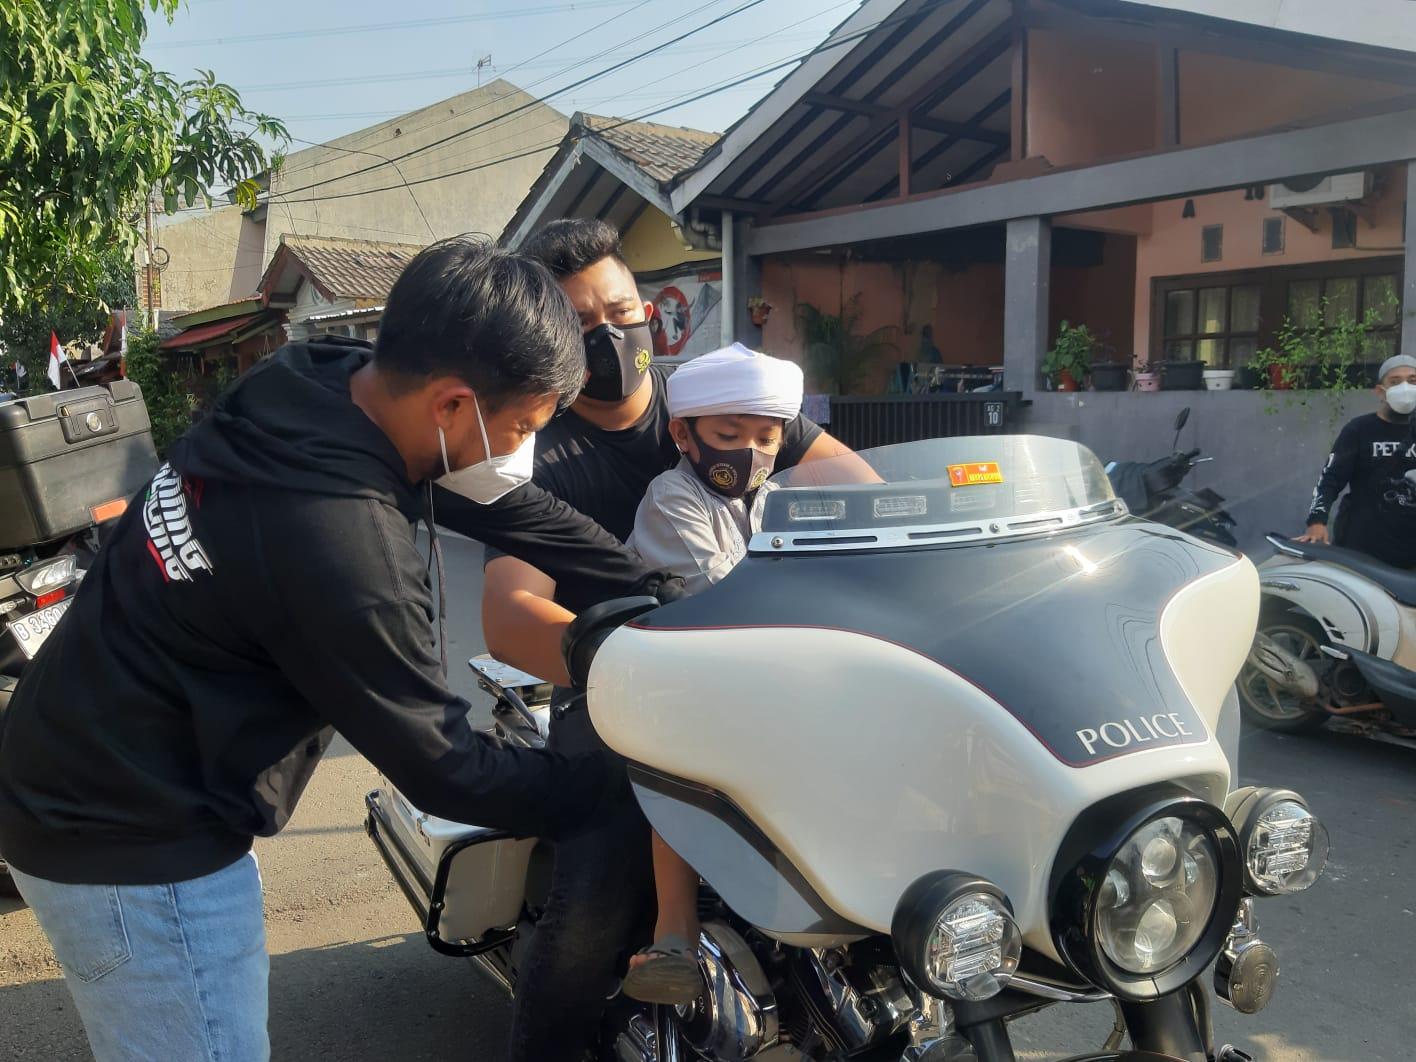 Salah satu perwakilan Komunitas Moge saat memberikan santunan Anak Yatim Piatu yang berlokasi Jalan Pinus Raya, Pamulang Barat, Tangsel pada Jumat, 6 Agustus 2021.